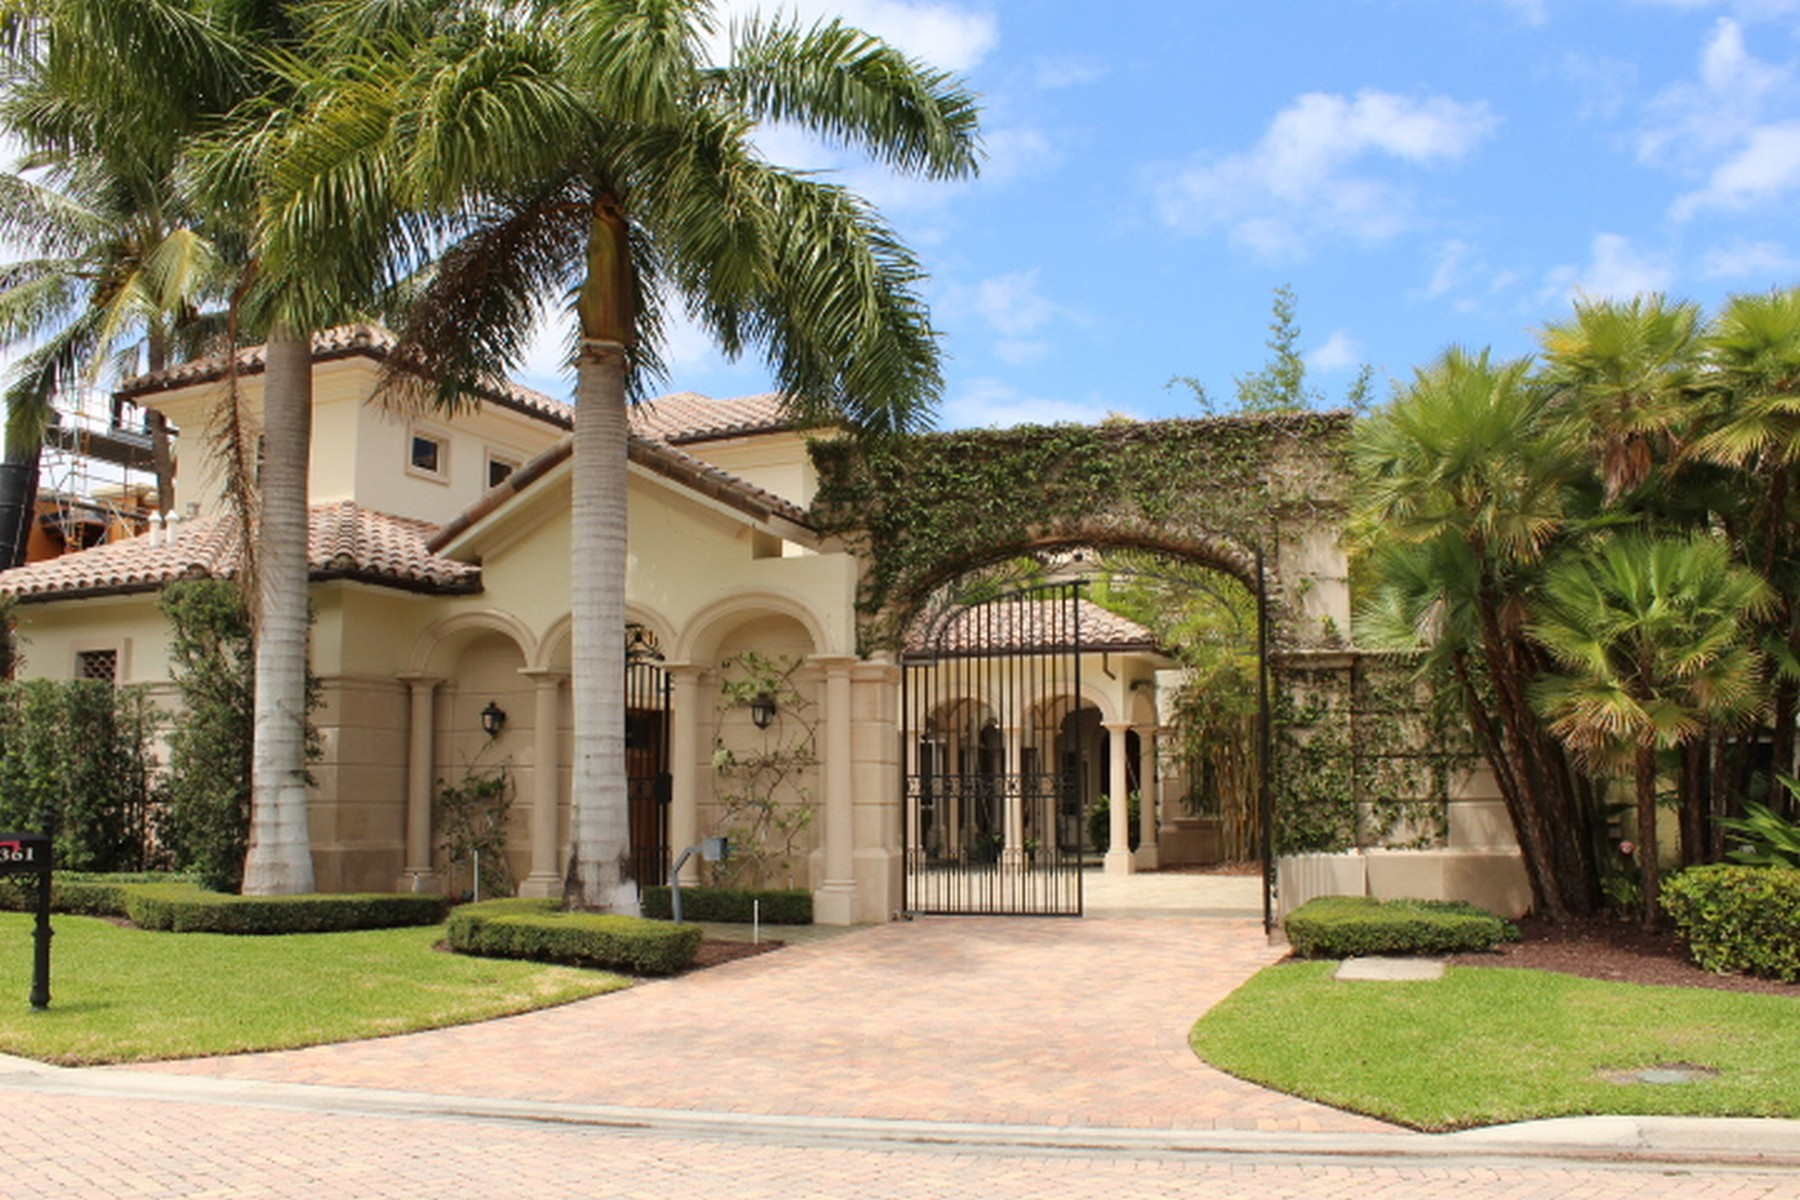 Moradia para Venda às 361 SE Mizner Lake Estates Dr , Boca Raton, FL 334 Boca Raton, Florida, 33432 Estados Unidos